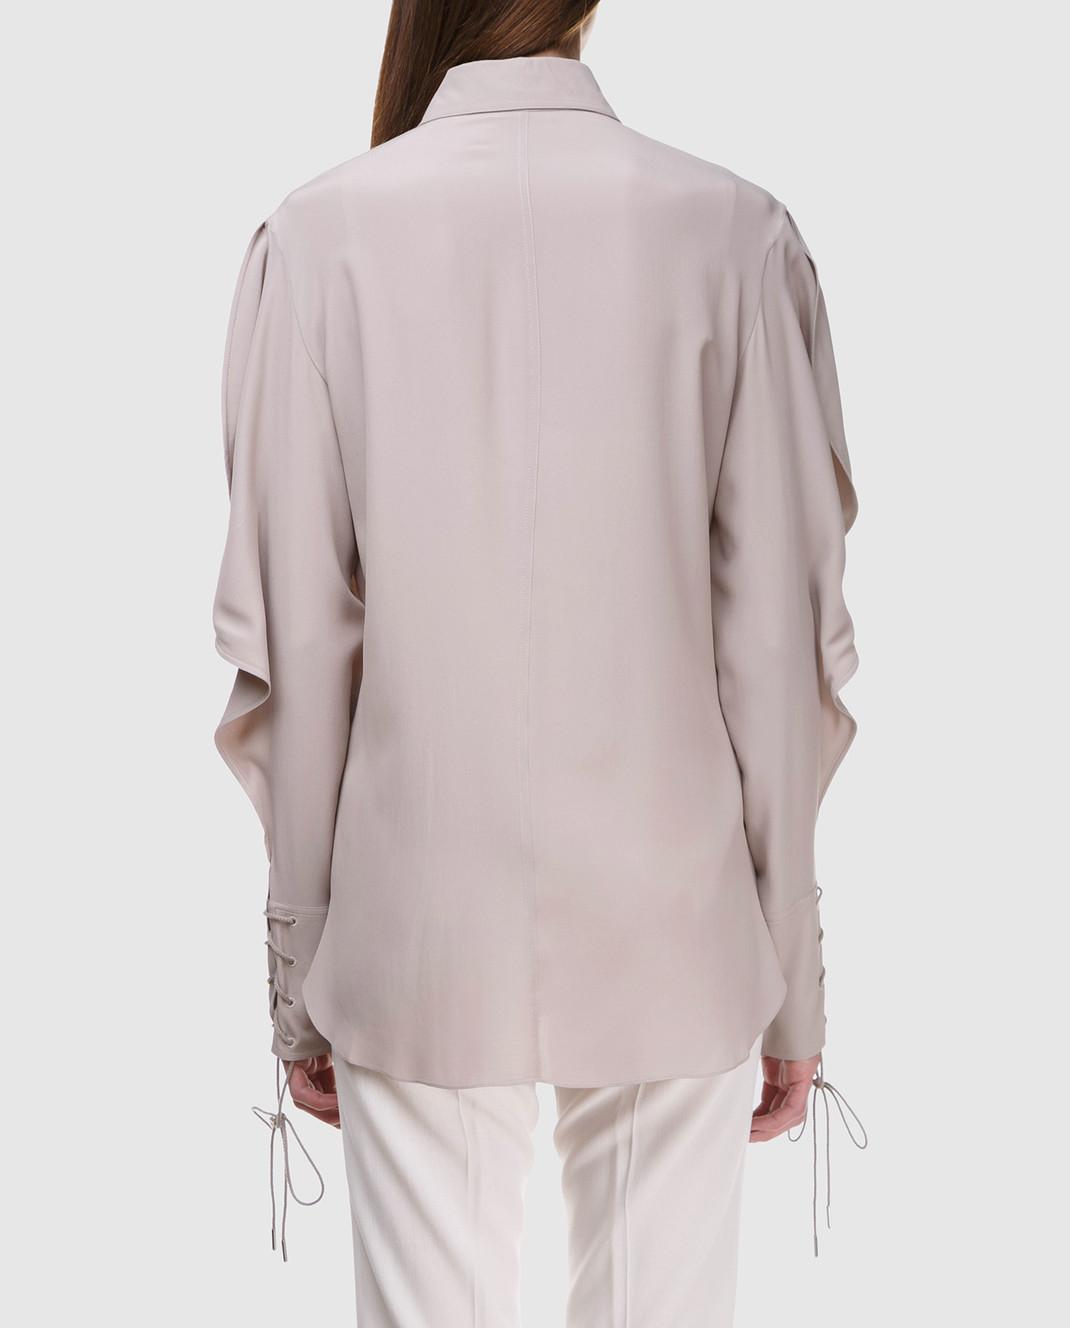 NINA RICCI Серая блуза 18PCTO002AC0109 изображение 4